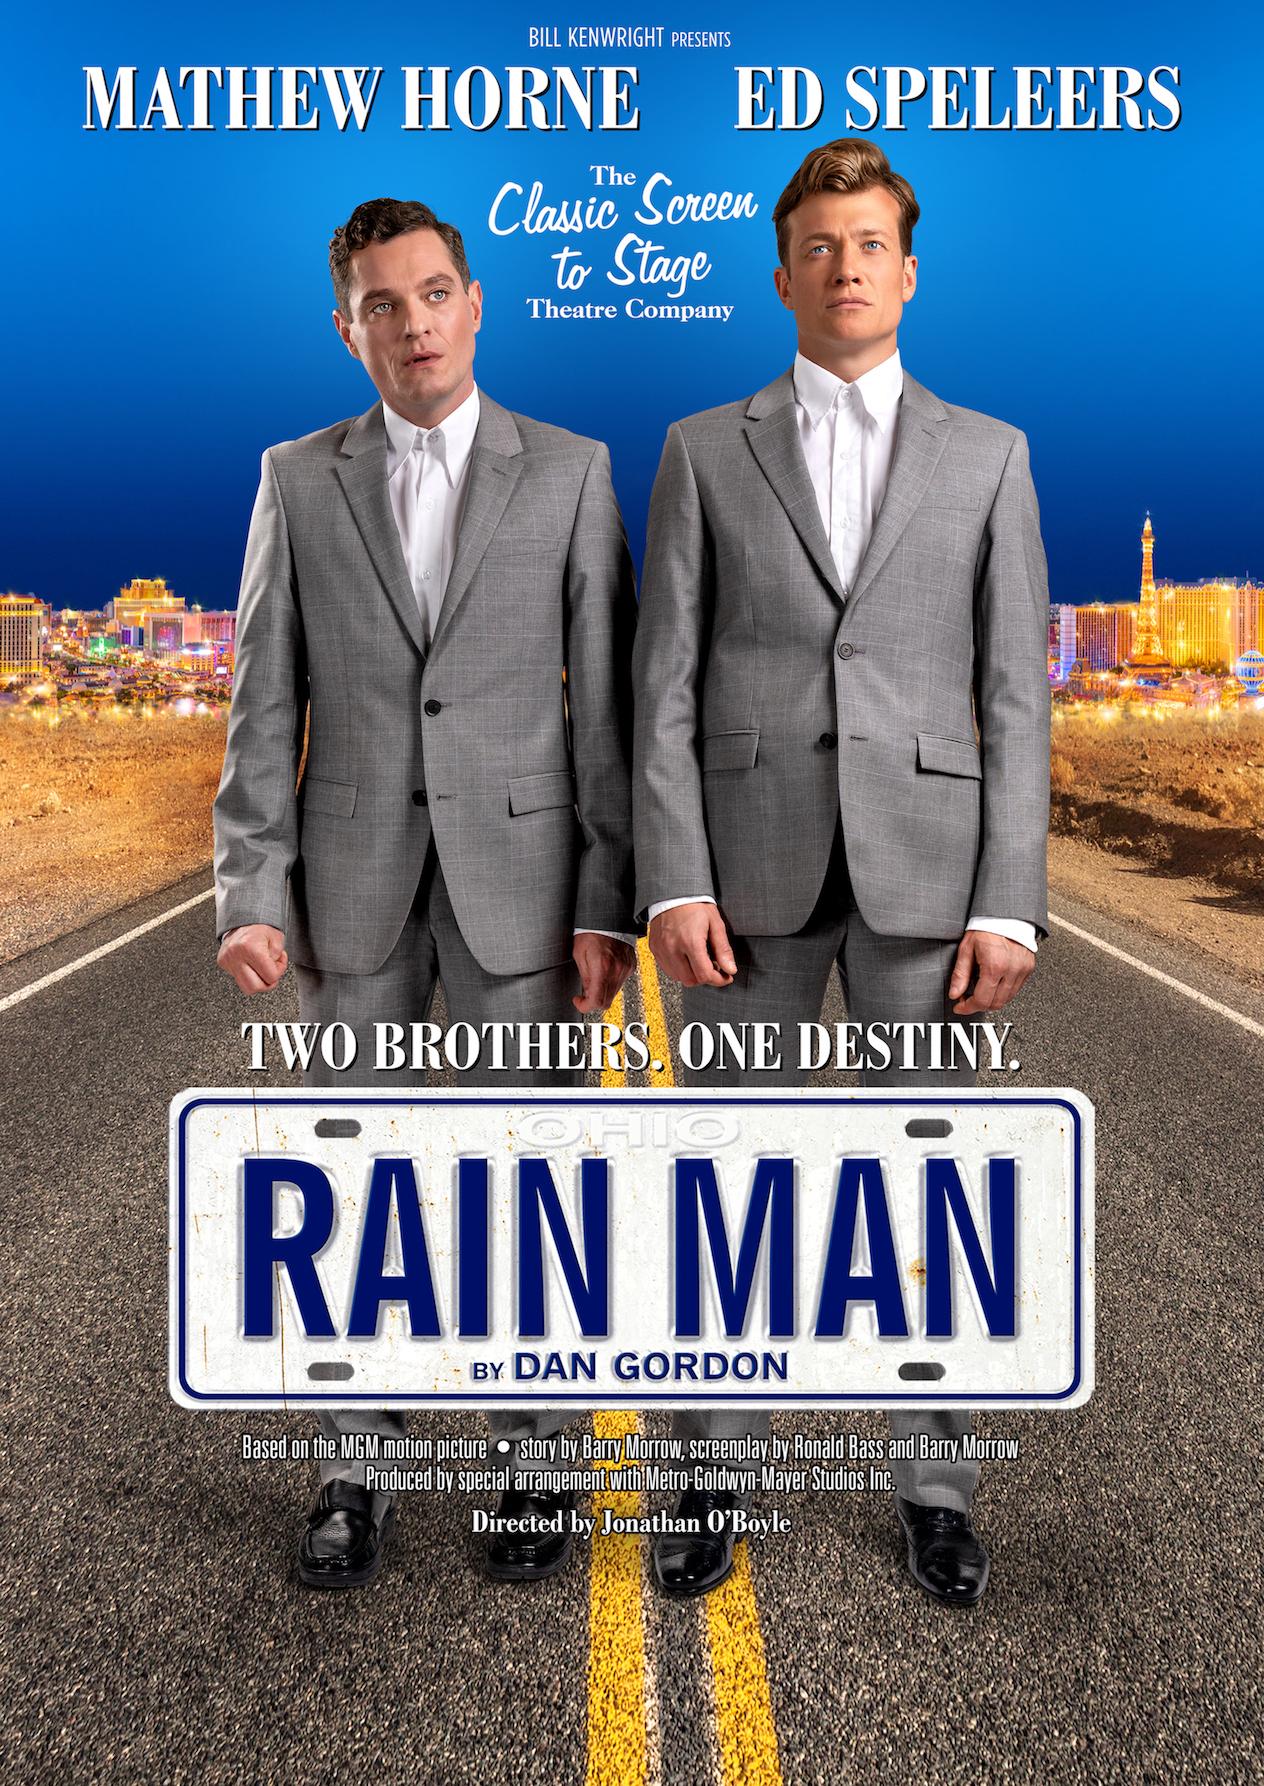 Rain Man Poster Press.jpg